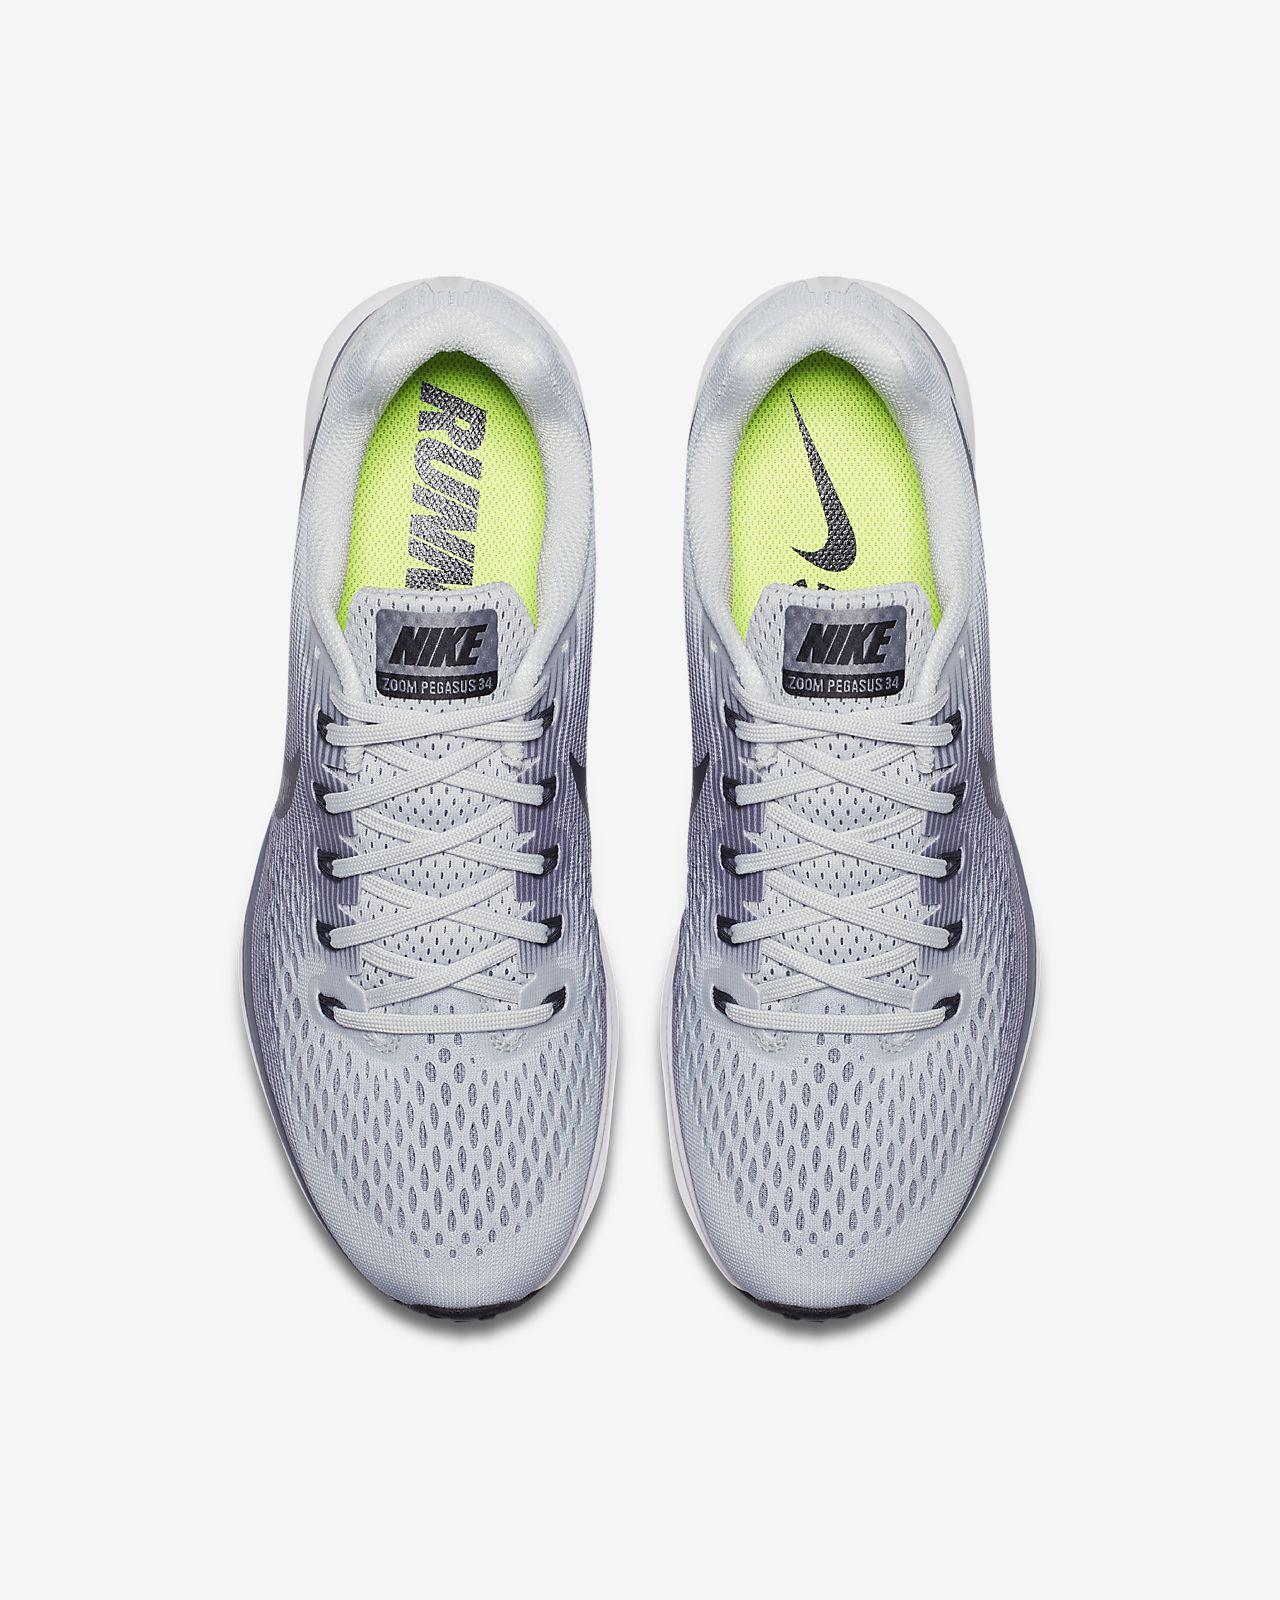 adf86066af488 Nike Air Zoom Pegasus 34 Men s Running Shoe. Nike.com NZ